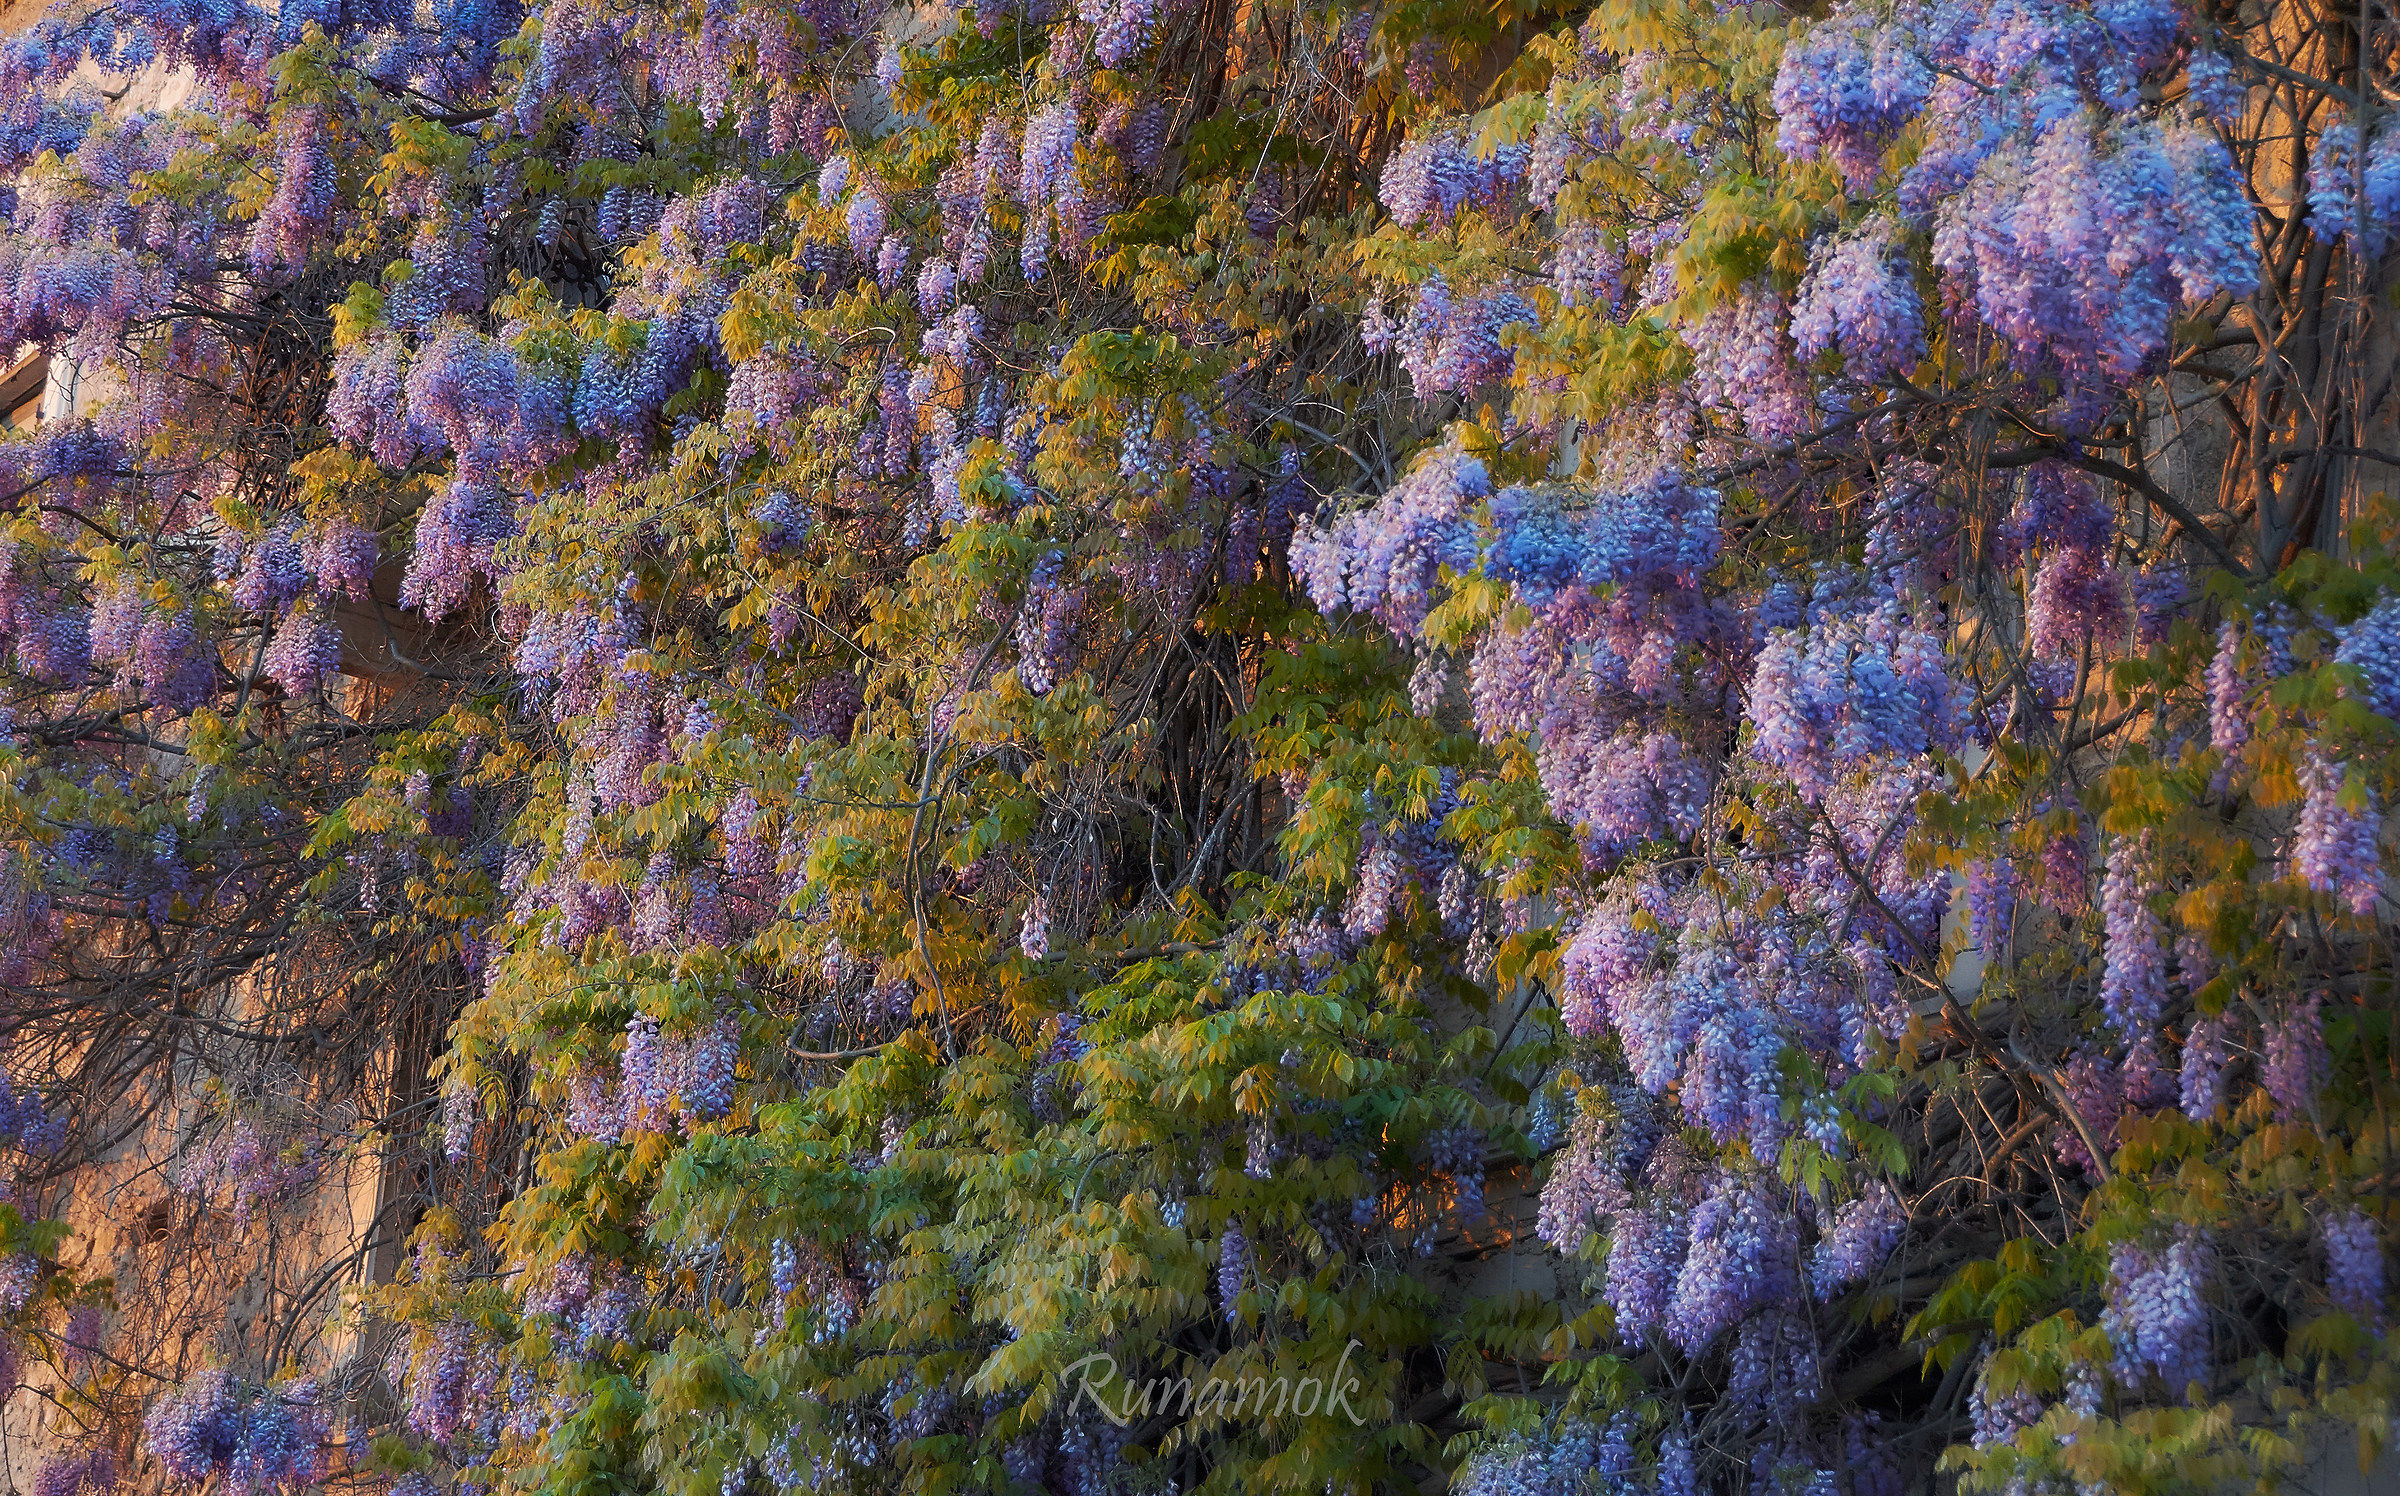 Centenarian wisteria...